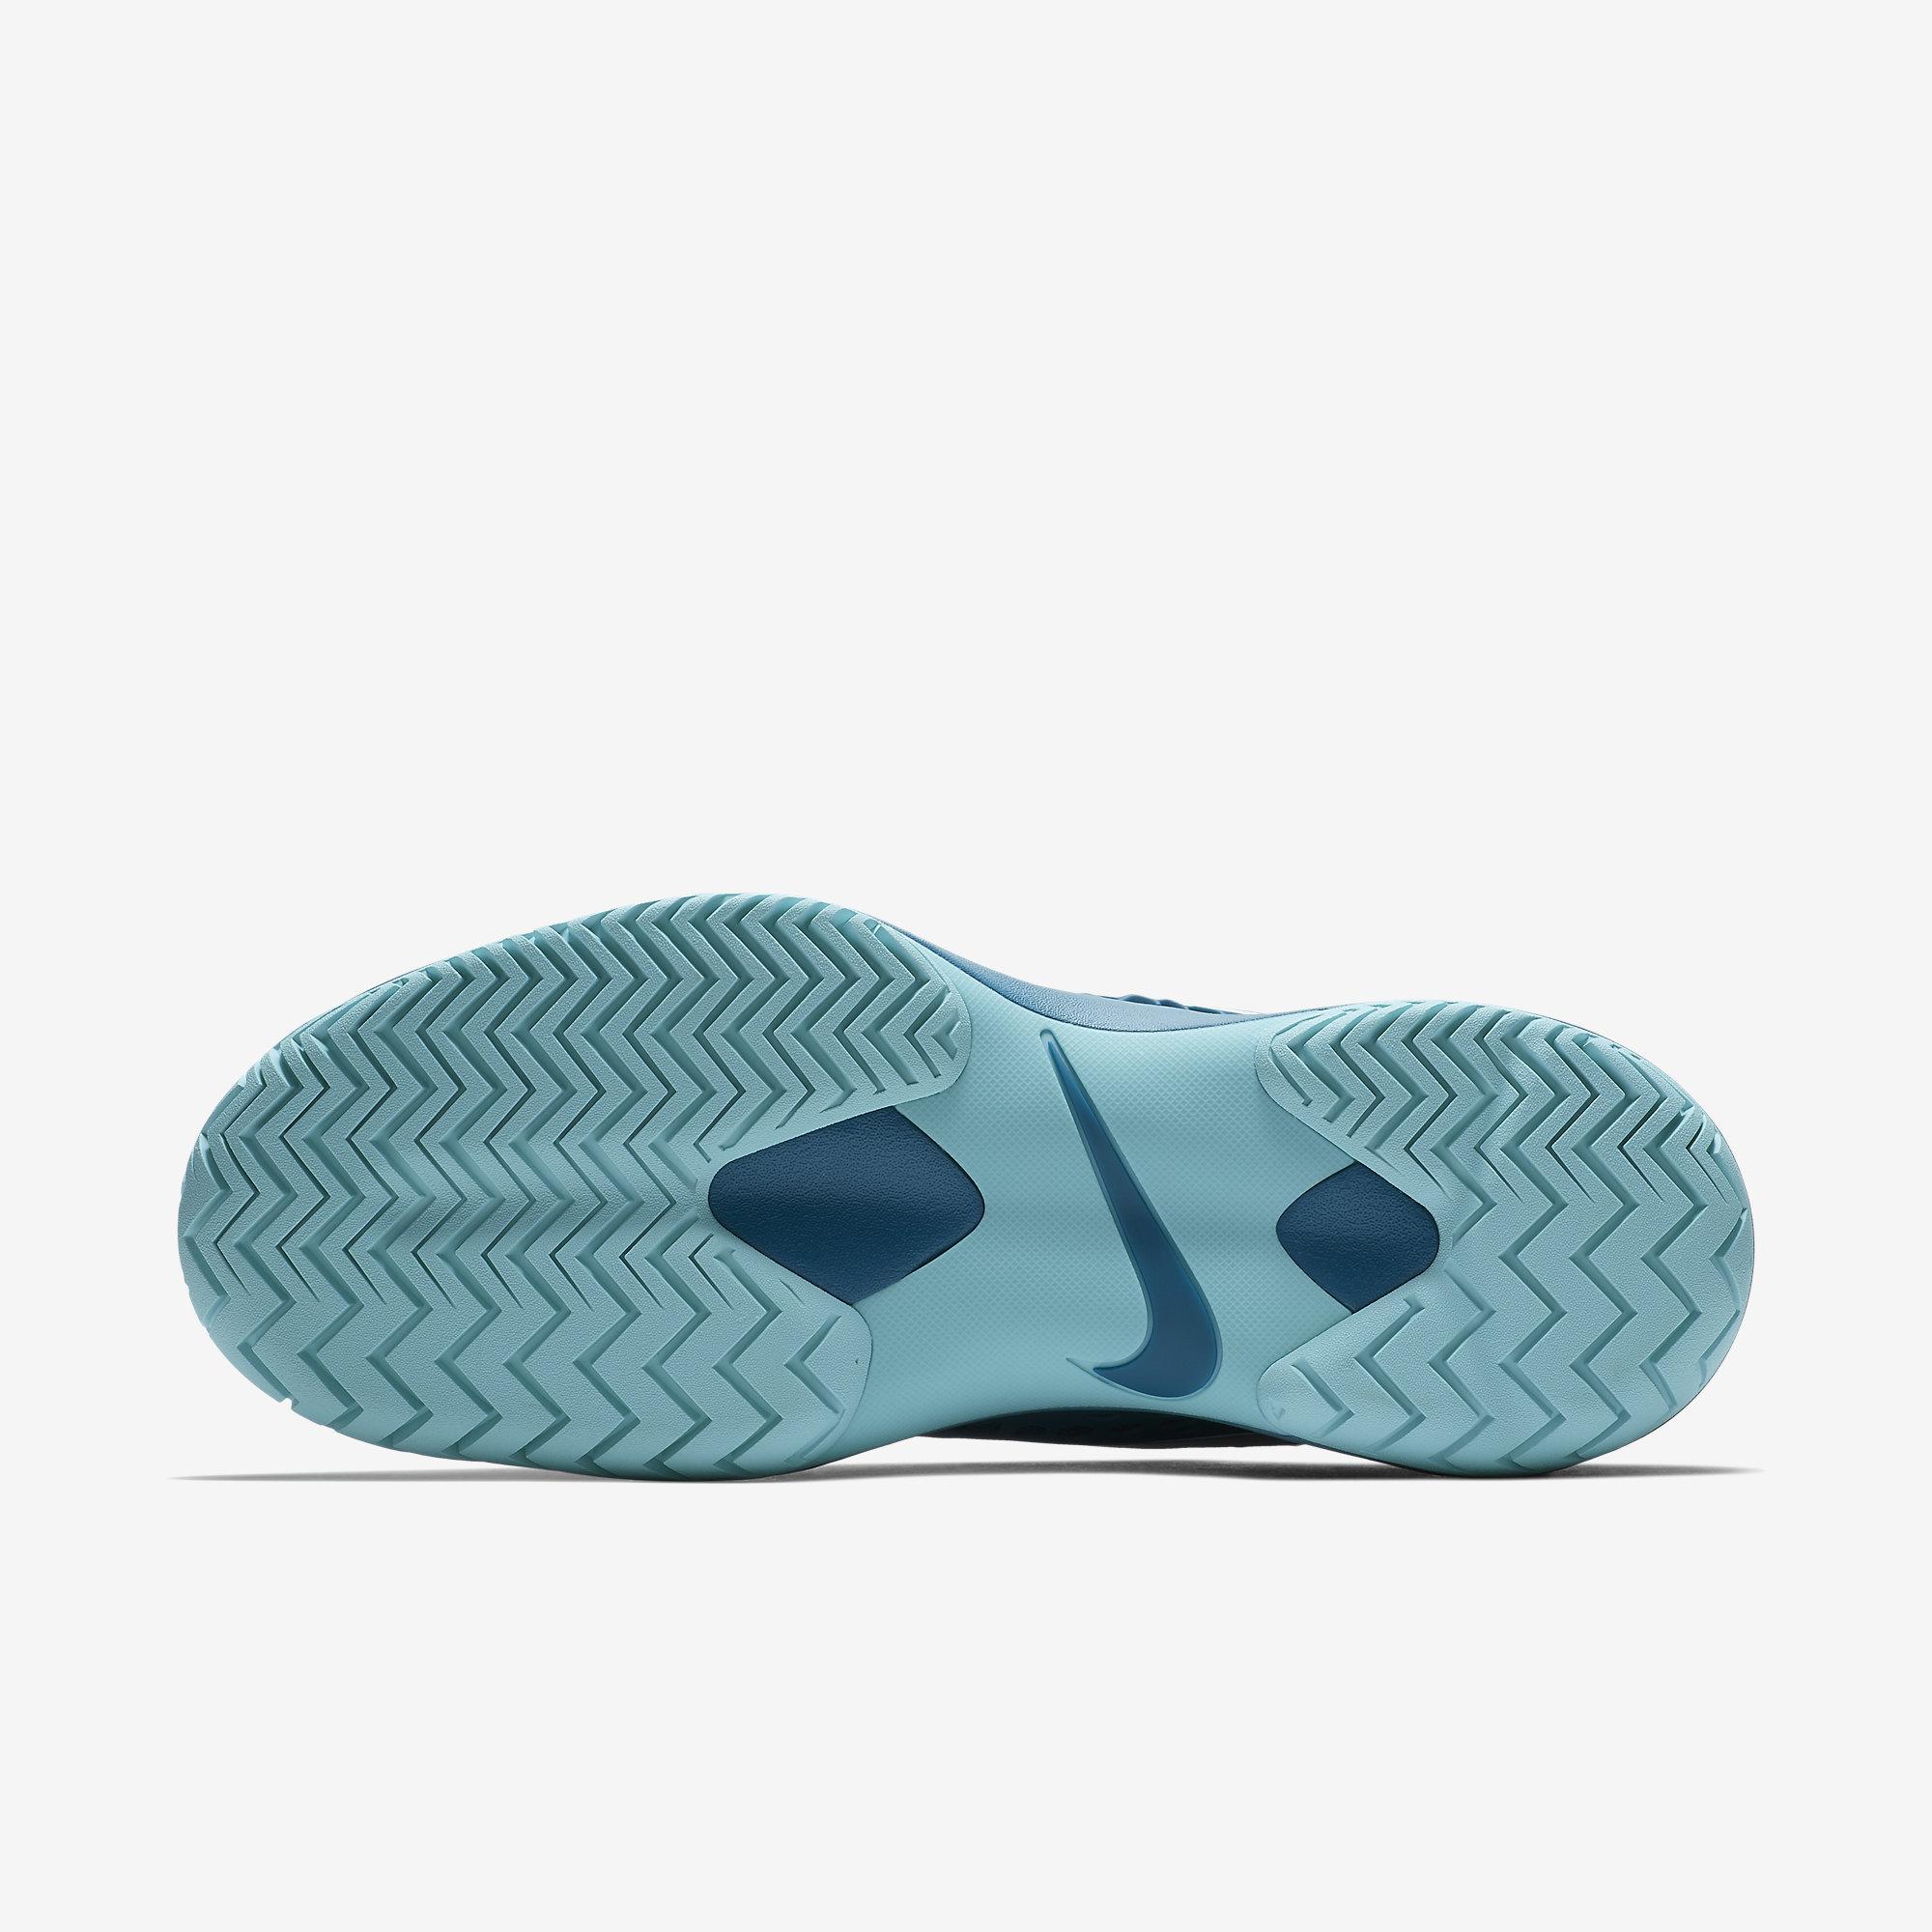 huge discount 58156 a1e43 Nike Mens Zoom Cage 3 Rafa Tennis Shoes - Green Abyss Metallic Silver